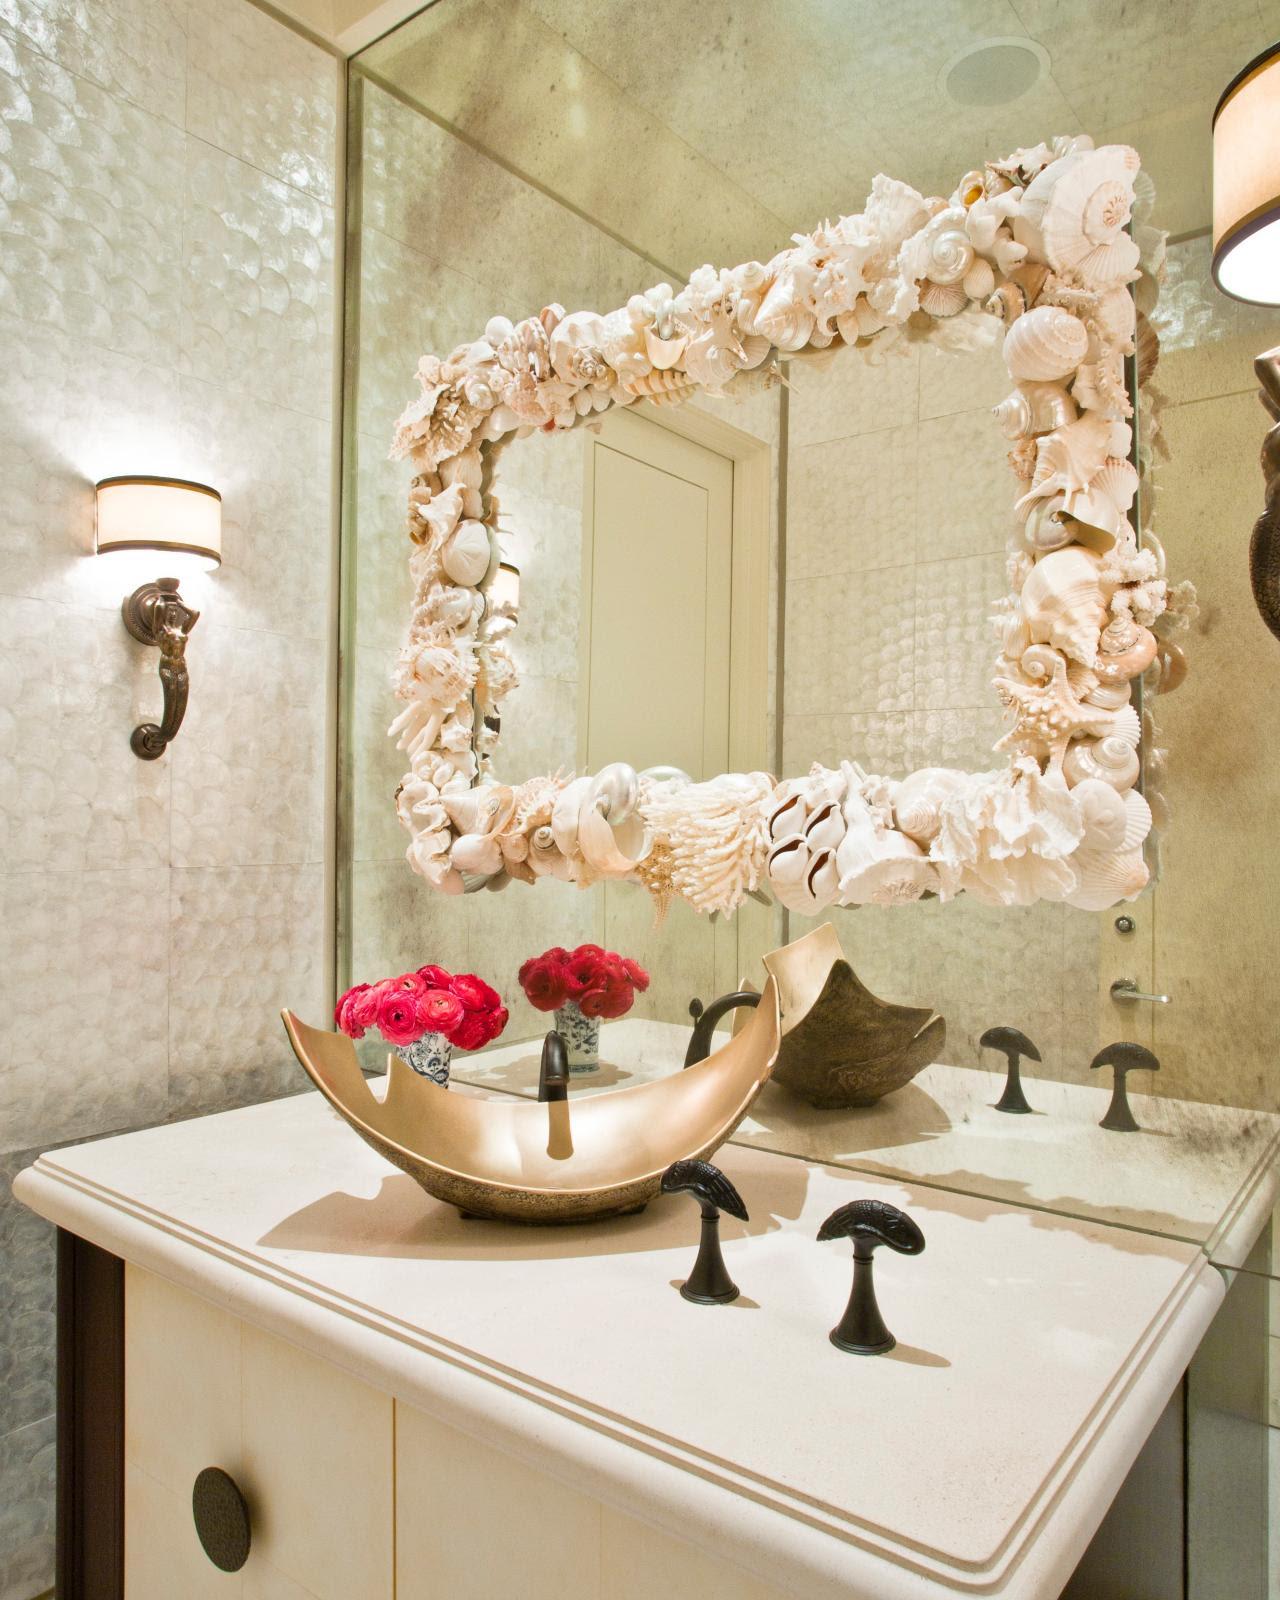 Contemporary Metallic Bathroom With Seashell Mirror | HGTV